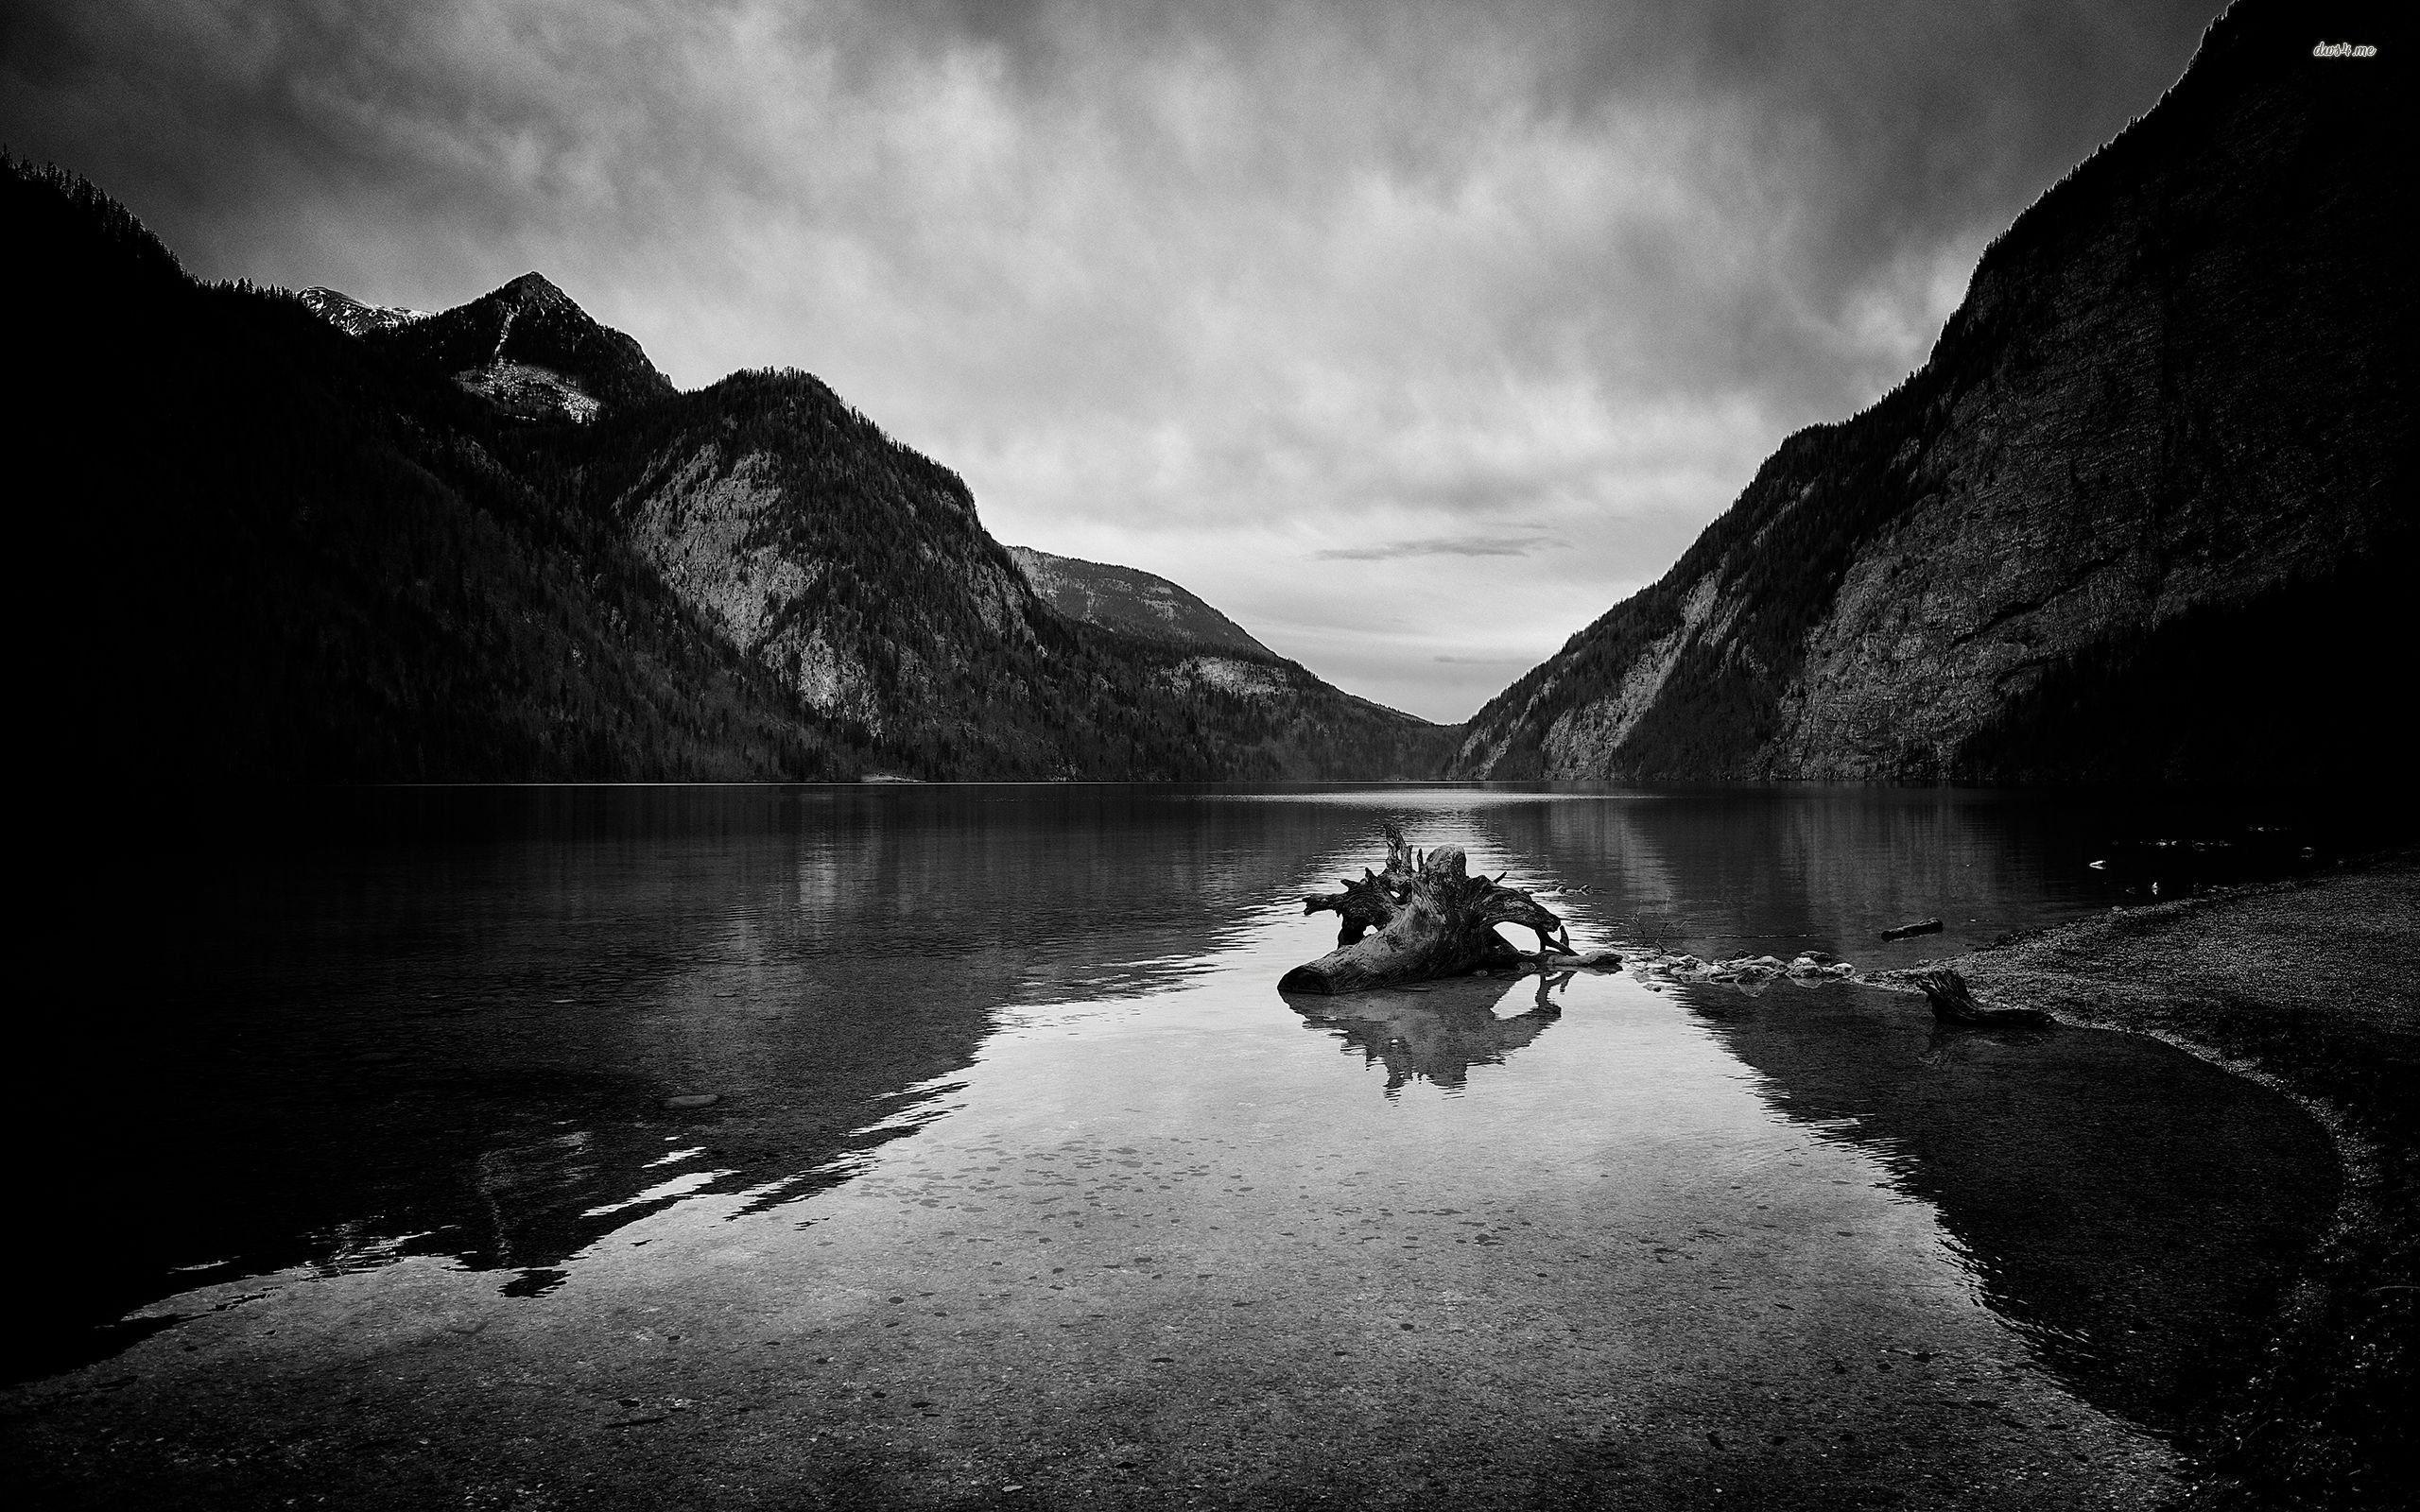 Mountain Scenery Black And White HD desktop wallpaper High